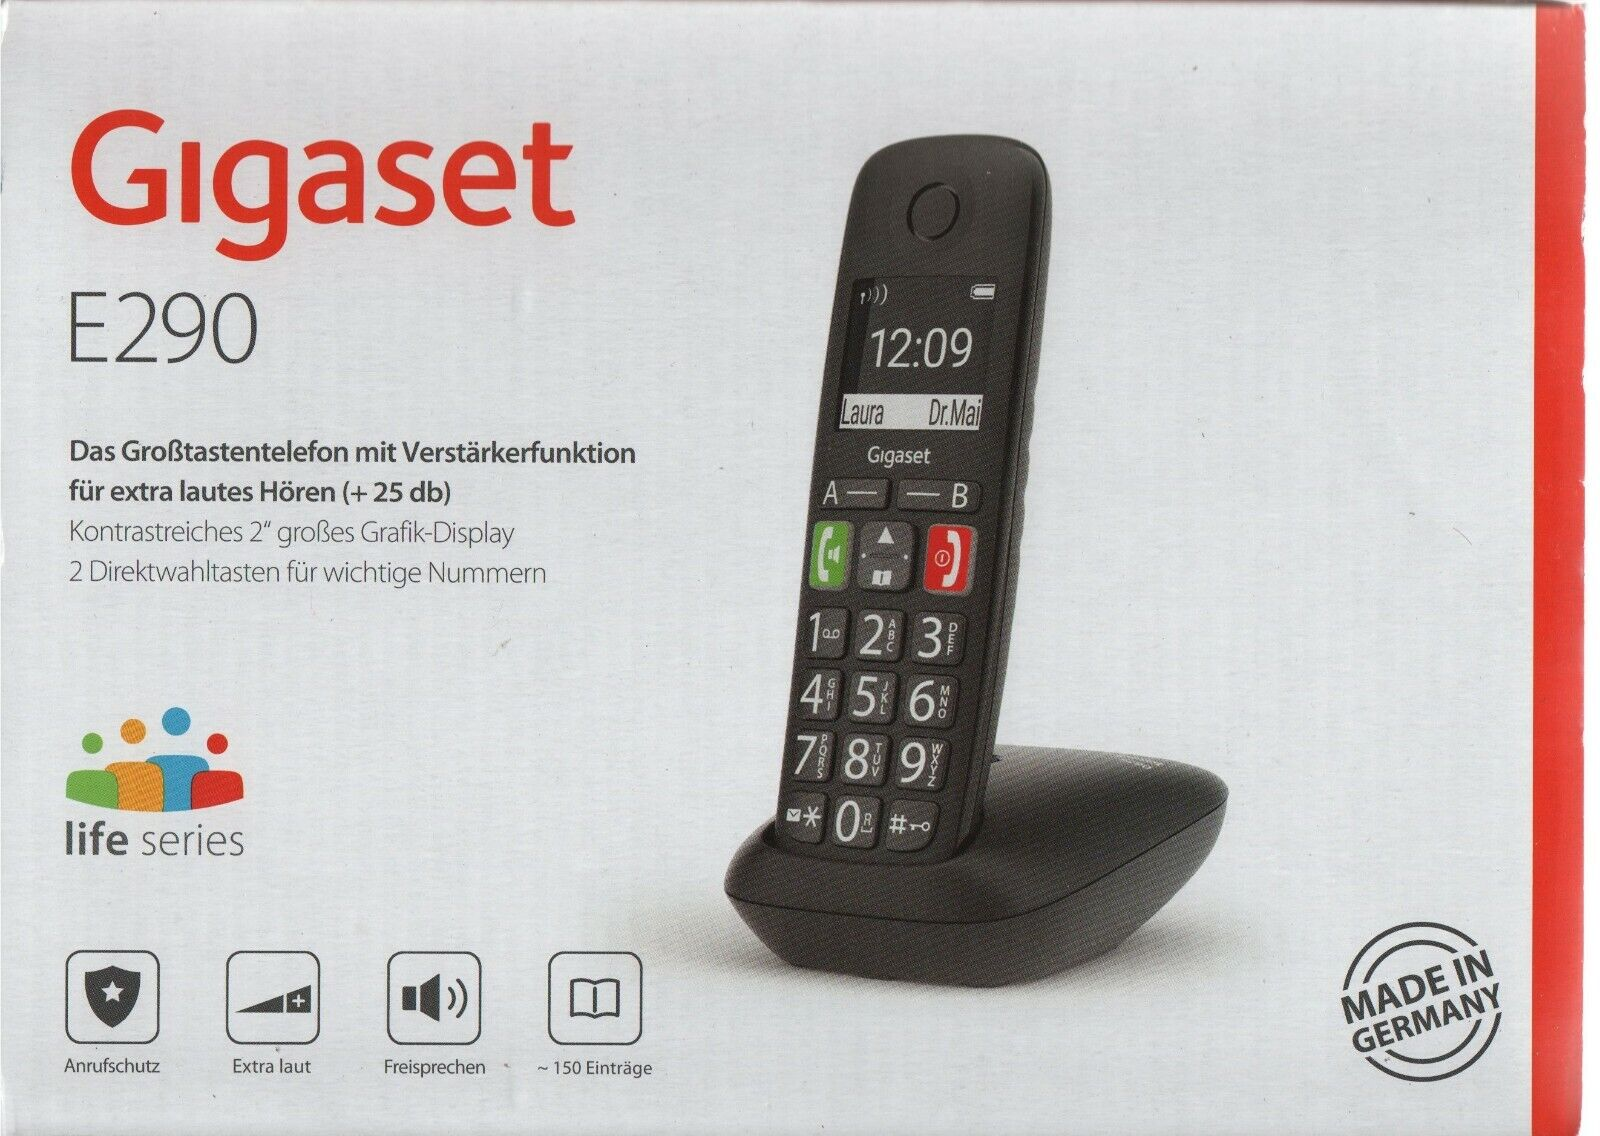 Gigaset E290 schnurloses-/ DECT-/ Analog Telefon schwarz